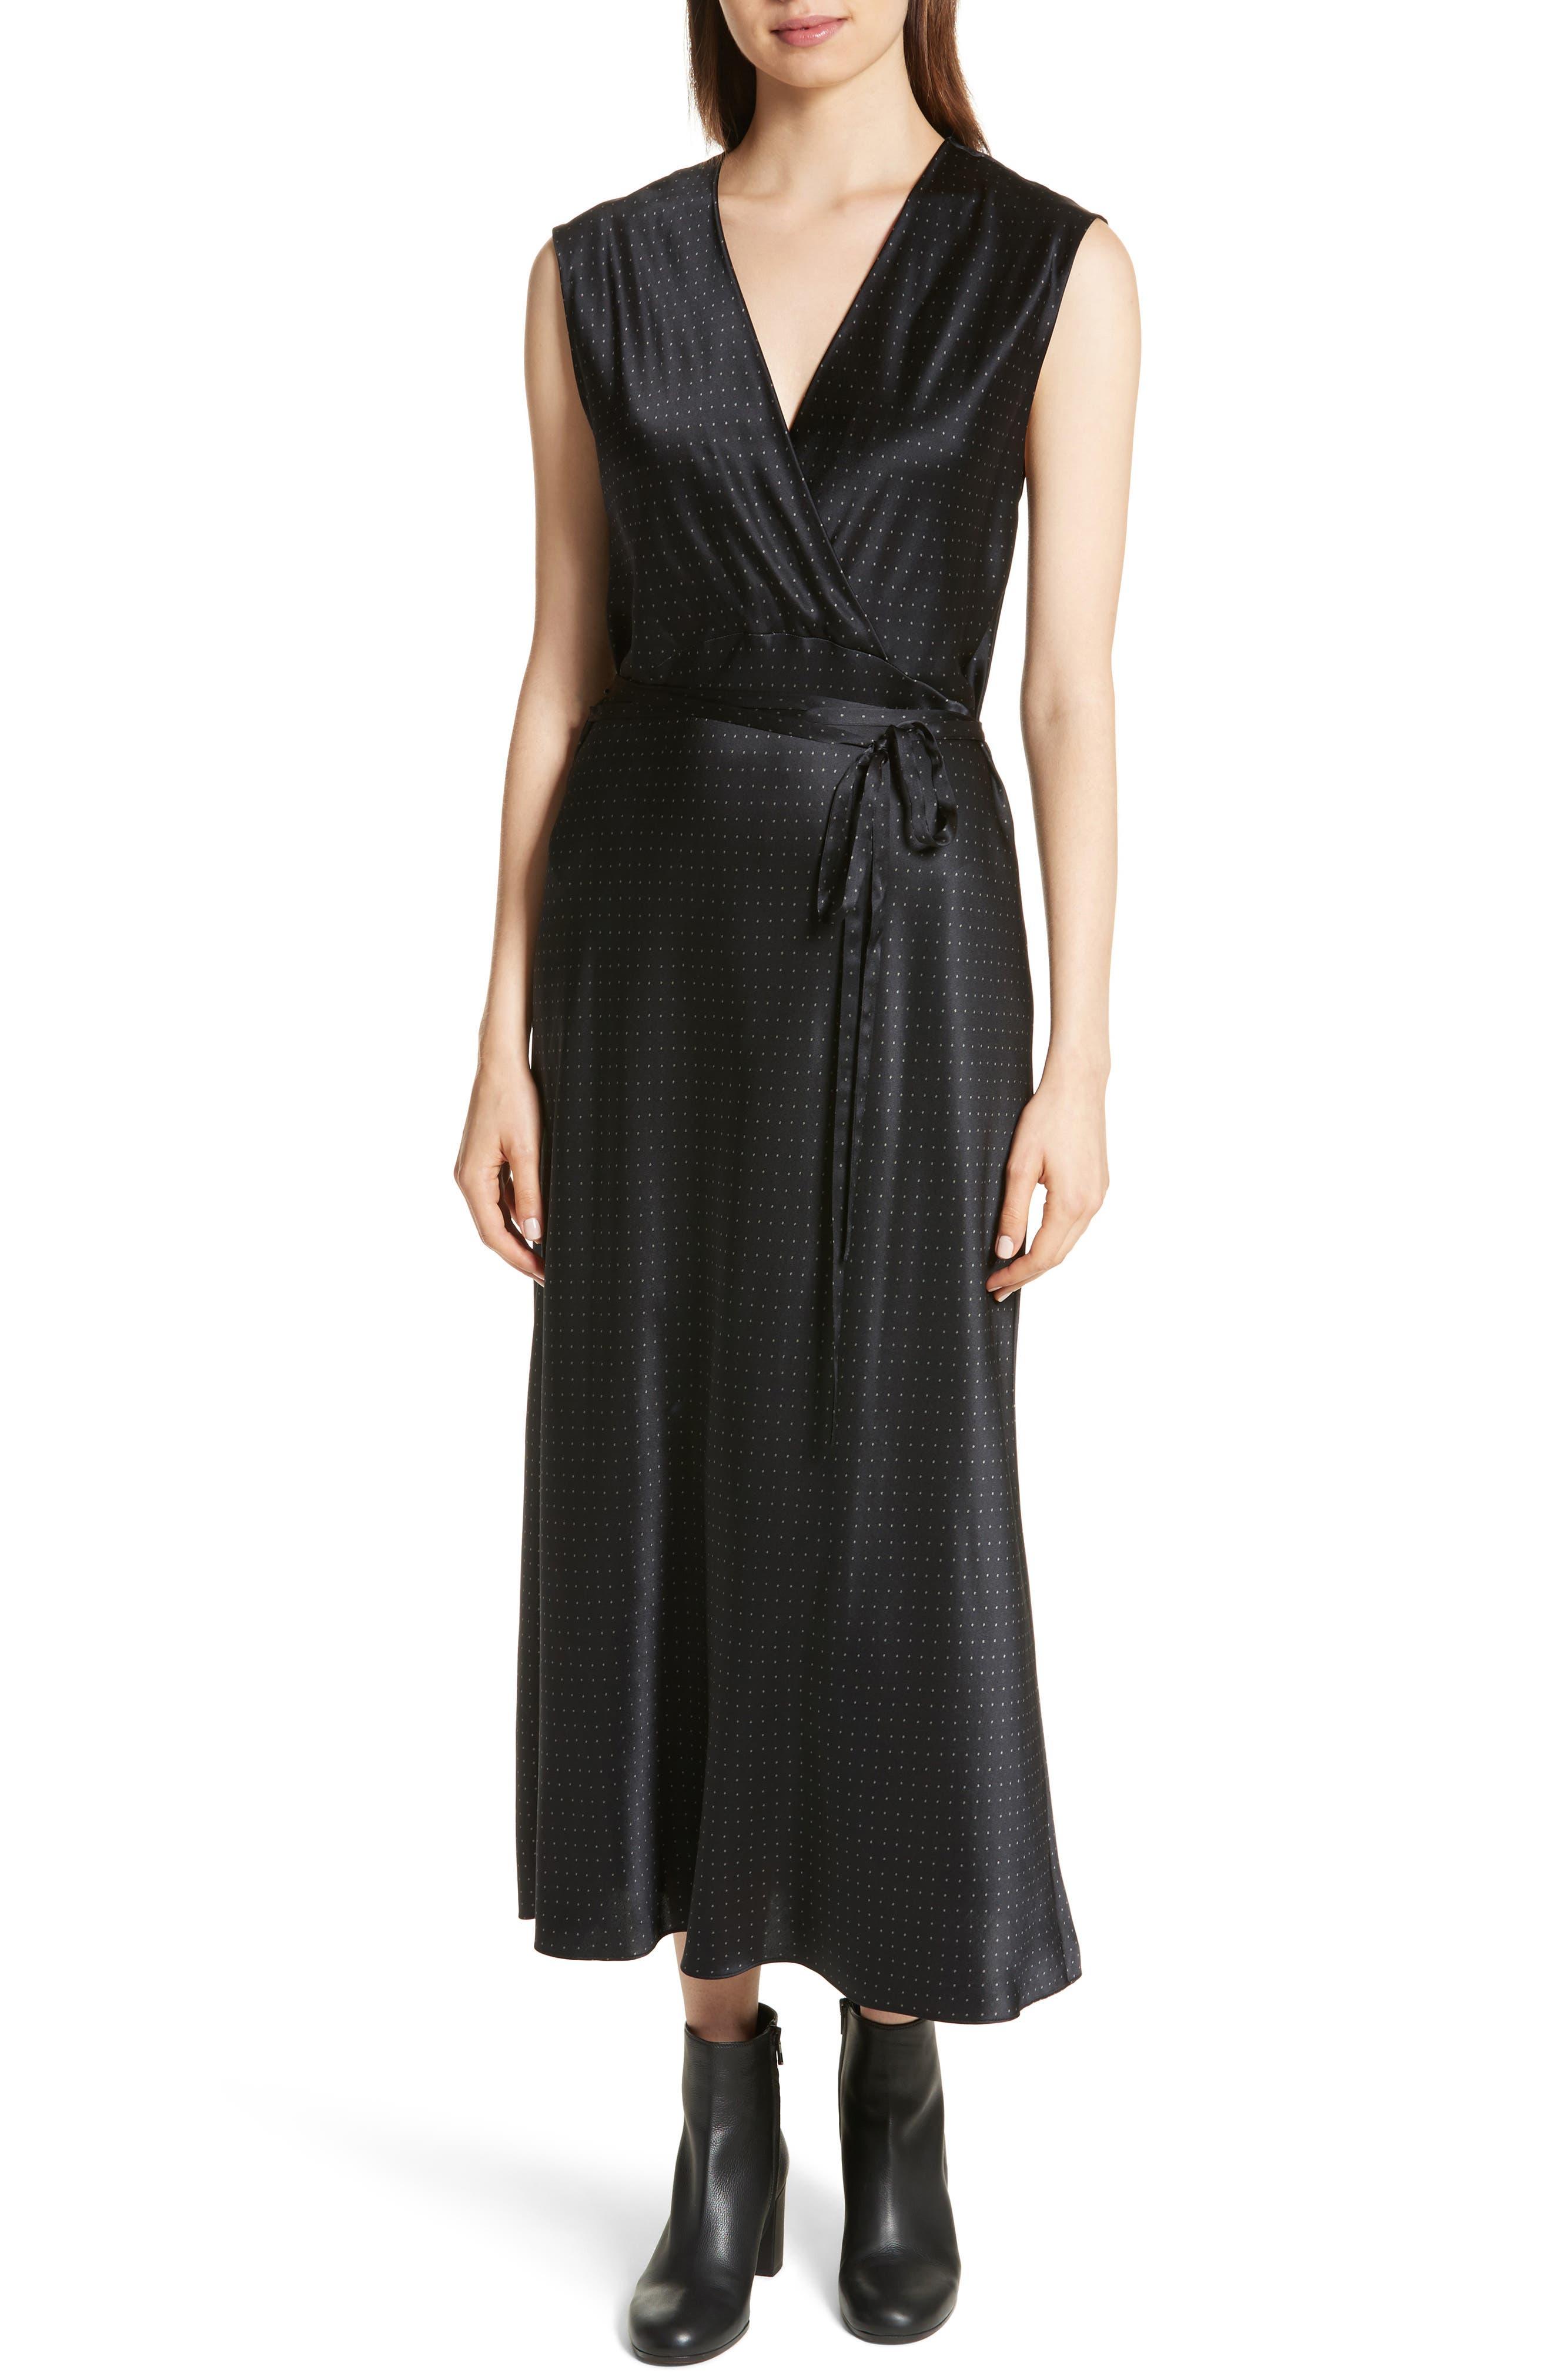 Alternate Image 1 Selected - Vince Vintage Polka Dot Faux Wrap Silk Dress